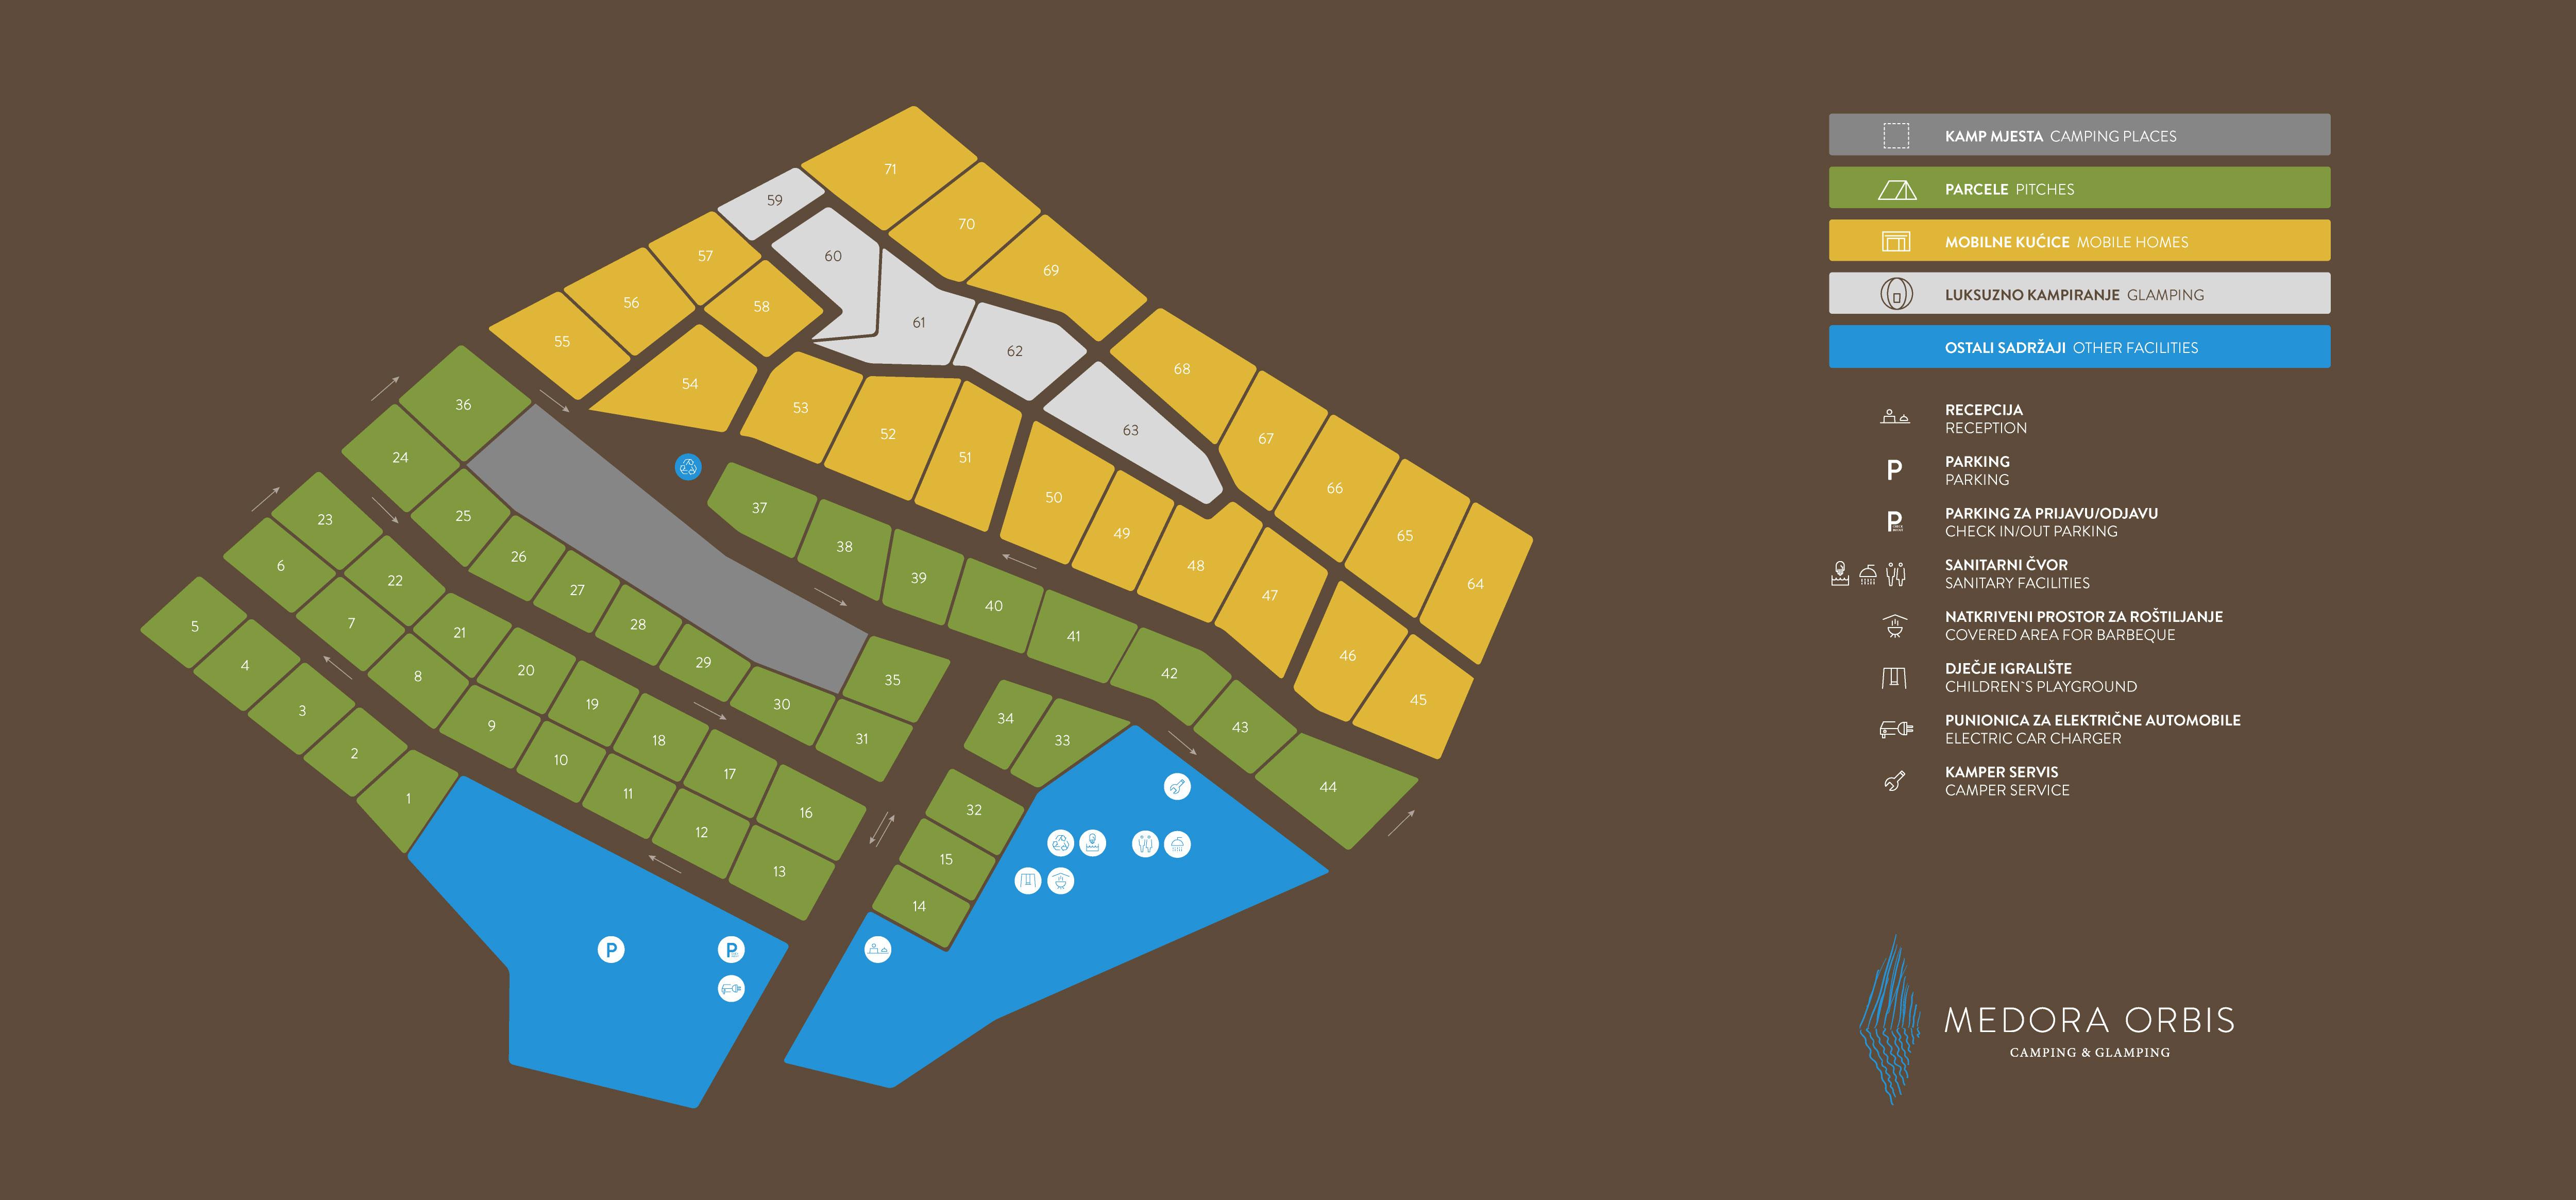 Medora_Orbis_Mapa_Web